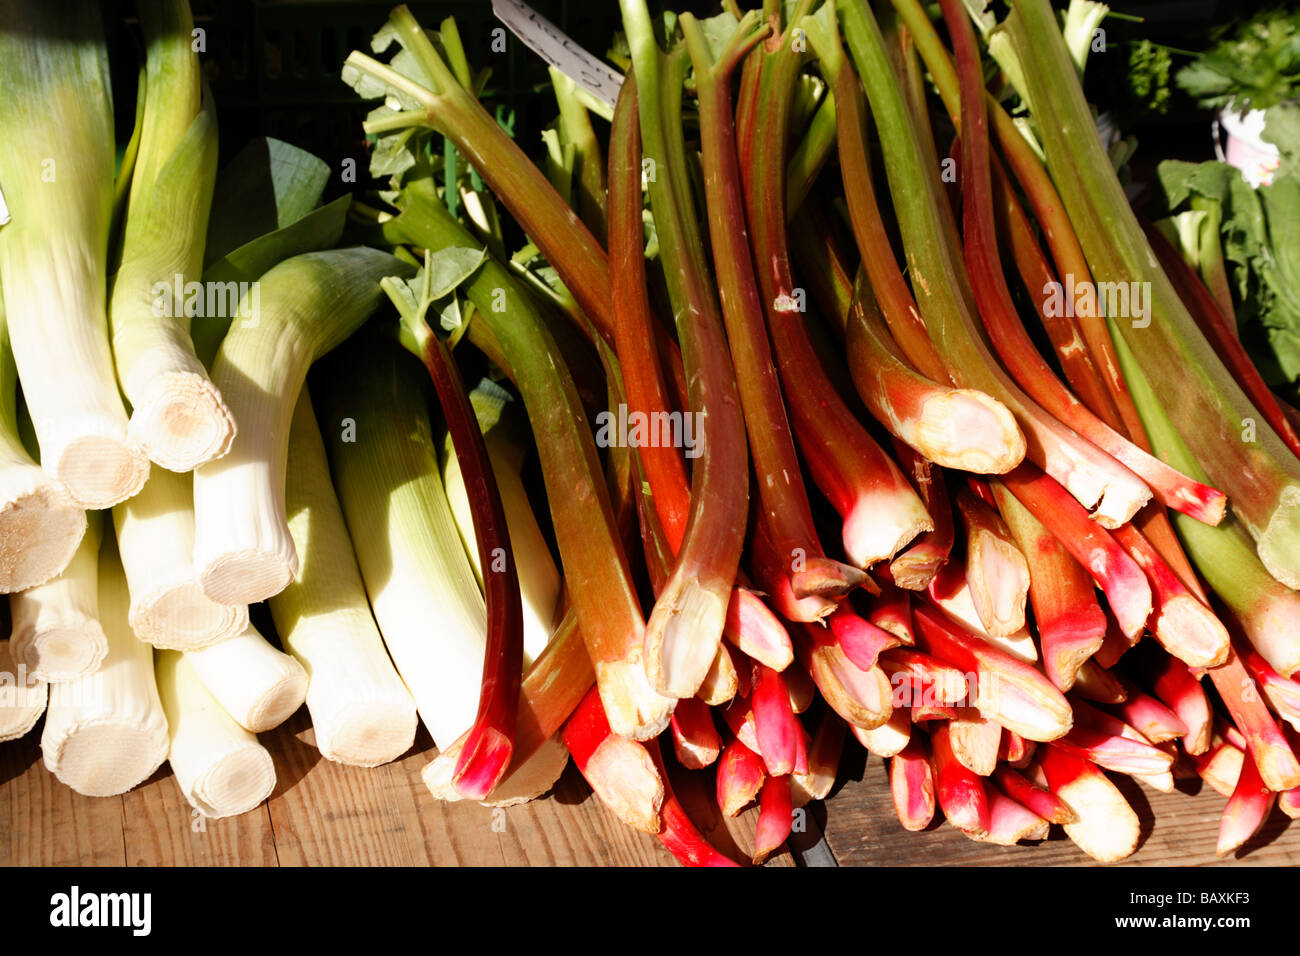 Fresh vegetables and fresh fruit at the market, Marktplatz, Basel, Switzerland - Stock Image